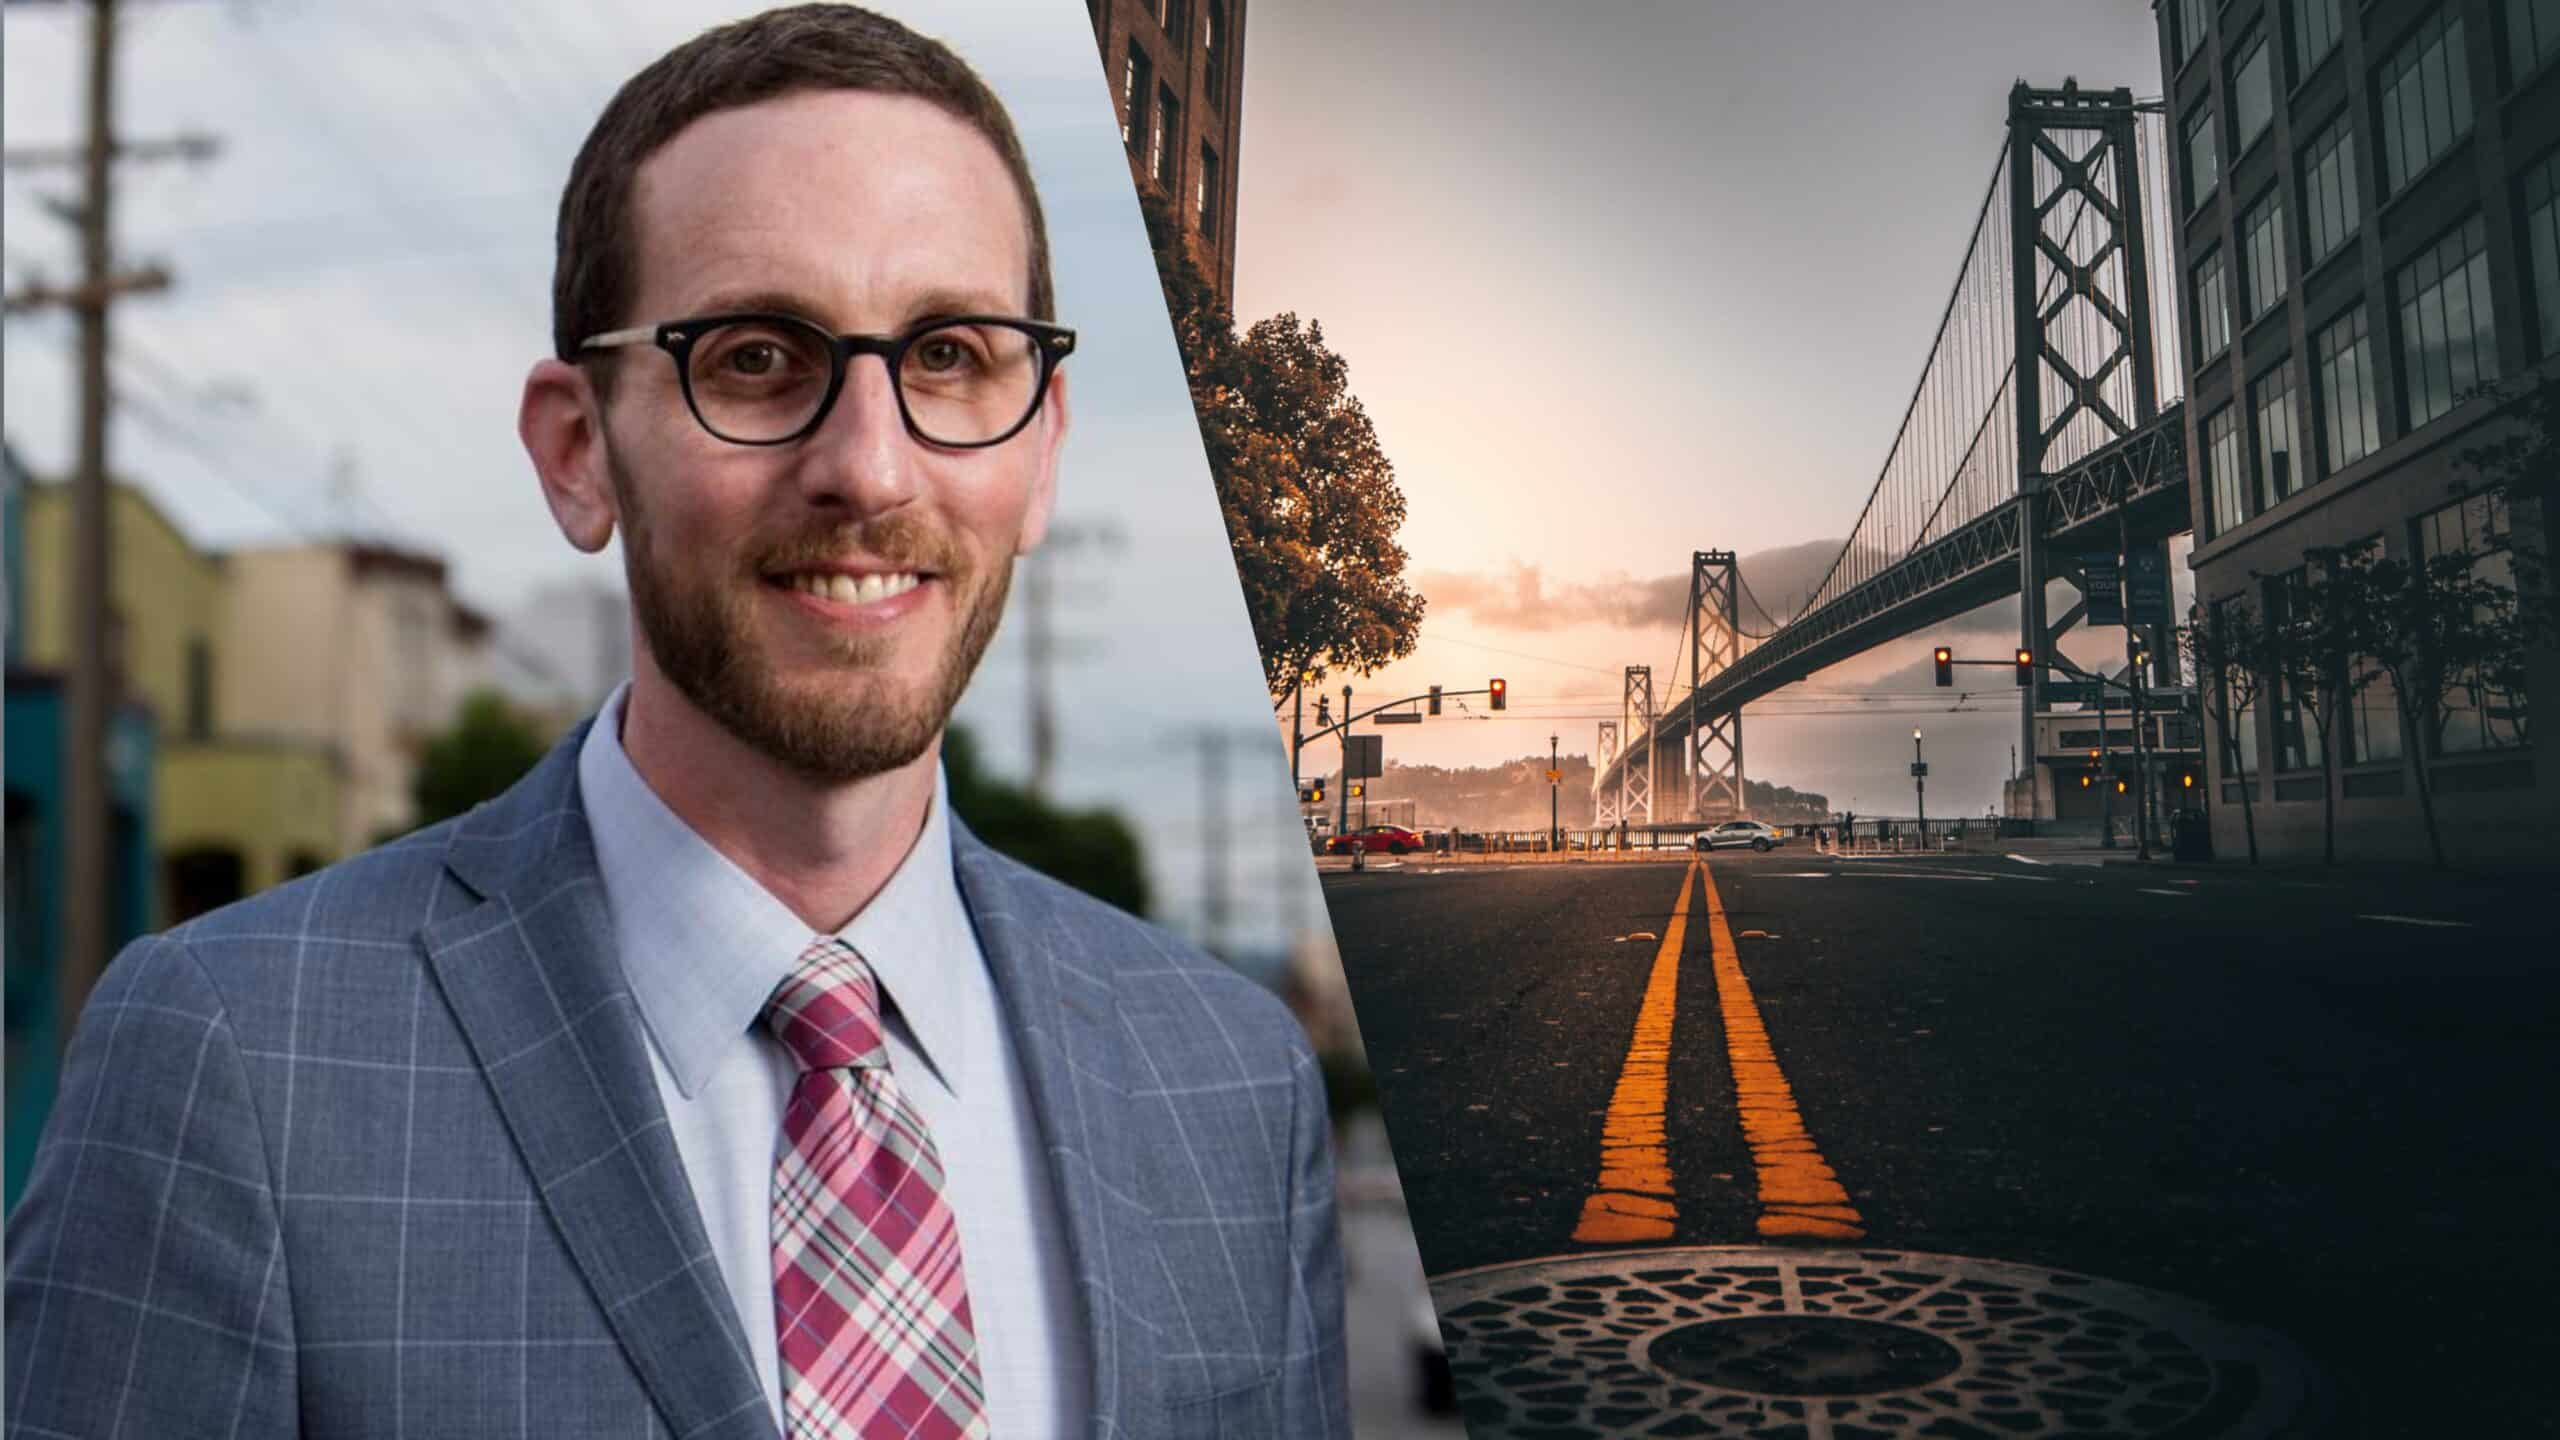 'Stupid & Dangerous': California Bill Seeks to Decriminalize Hallucinogenic Drugs 1